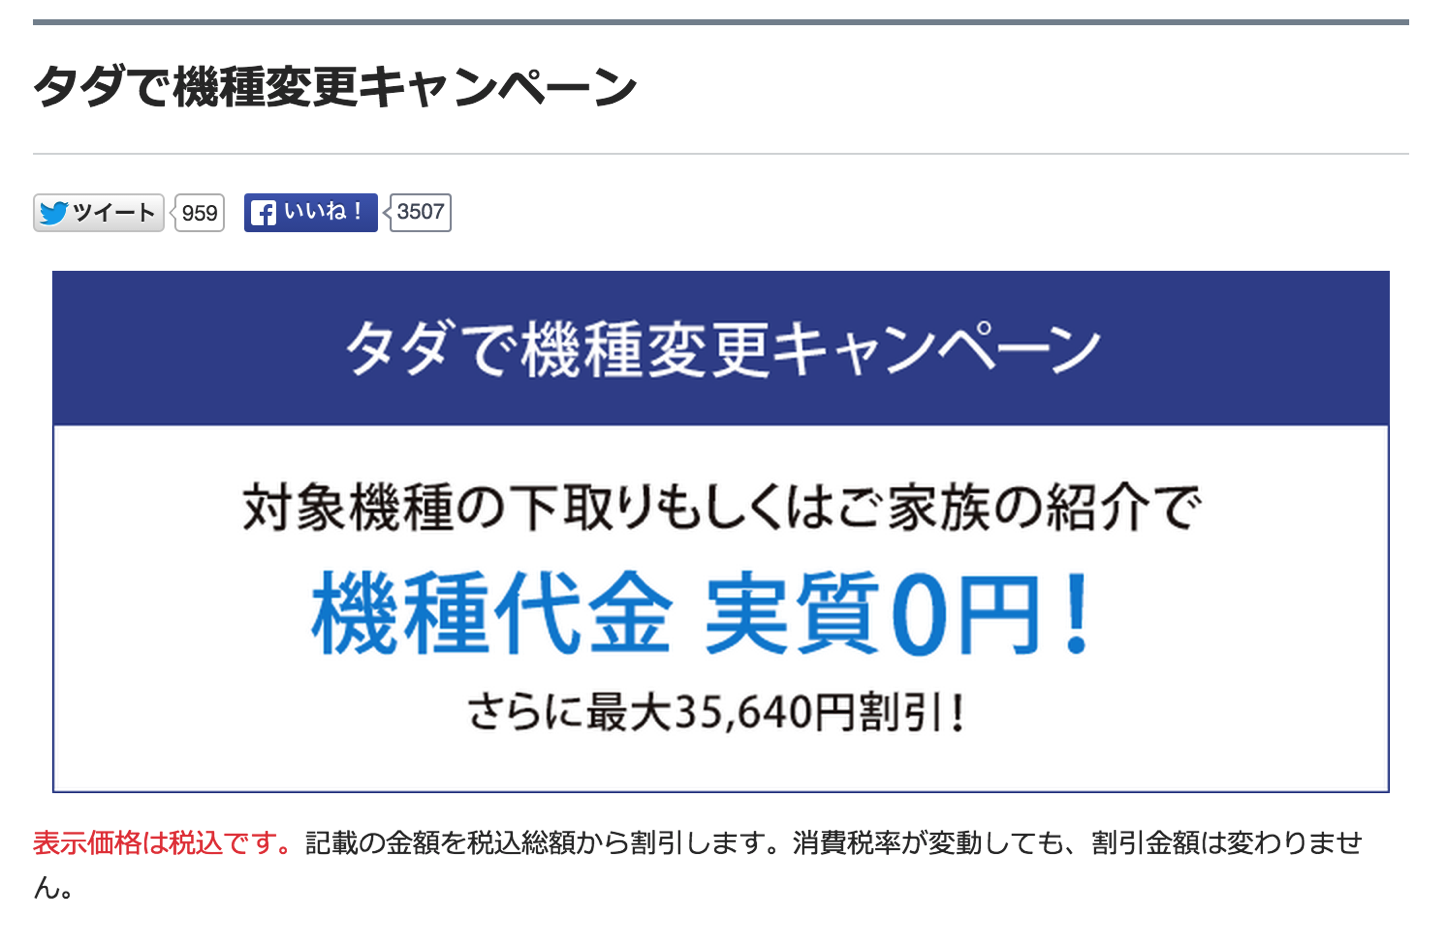 Free softbank